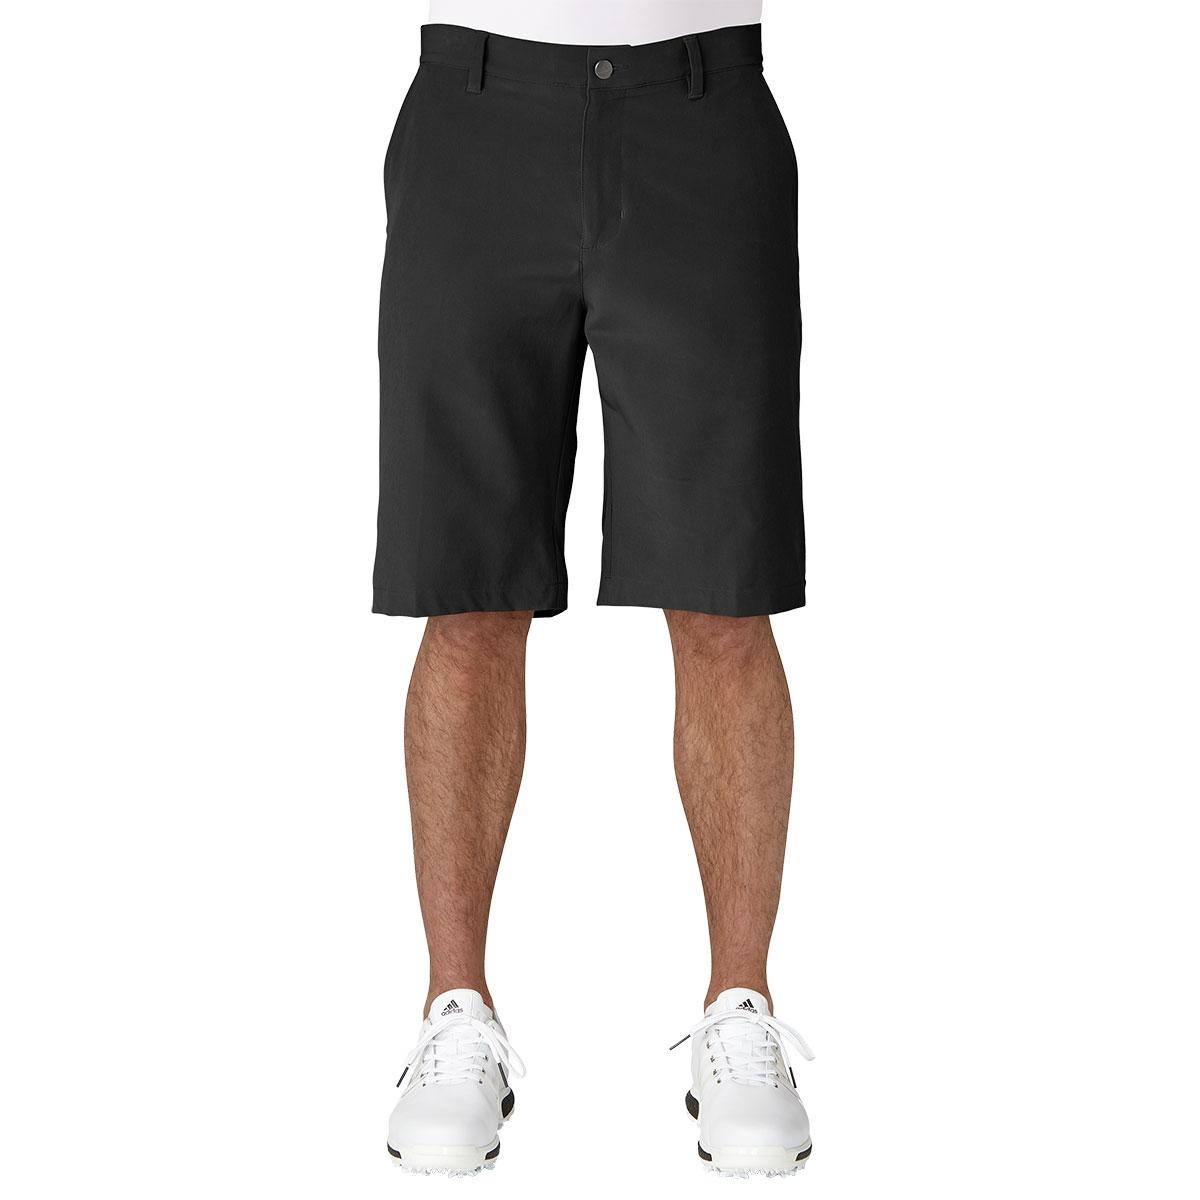 Adidas Mens 2018 Ultimate 365 Short - Black